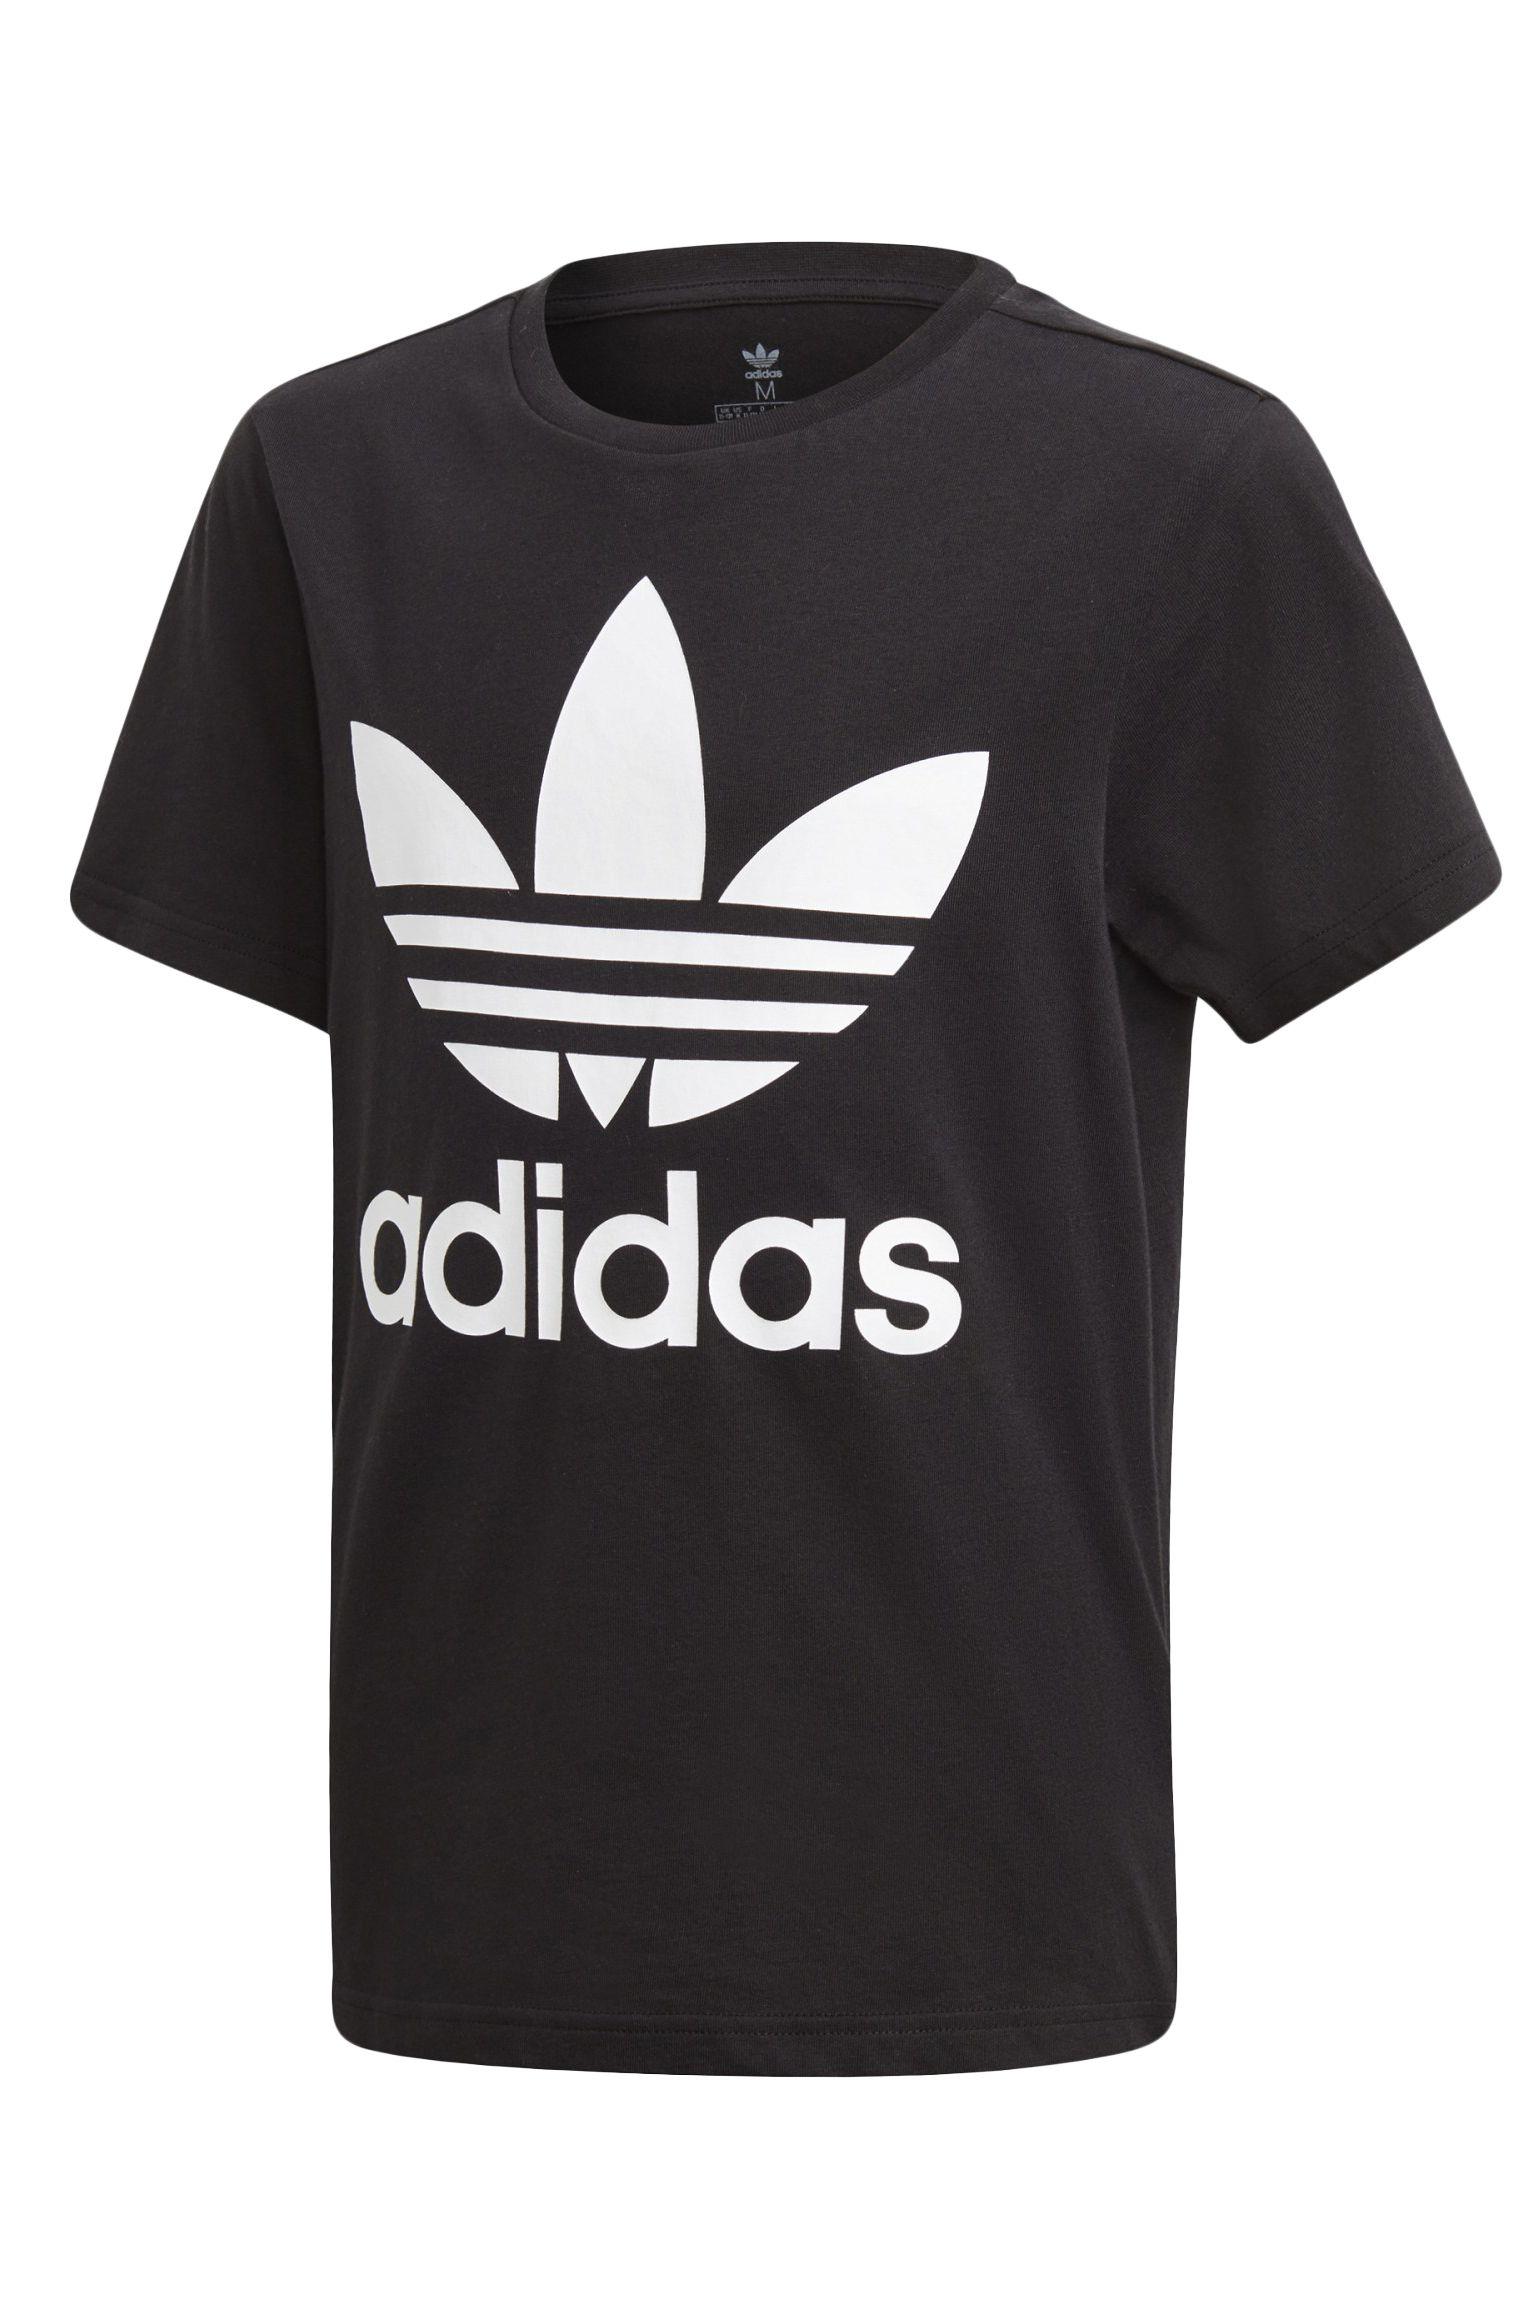 T-Shirt Adidas TREFOIL TEE Black/White